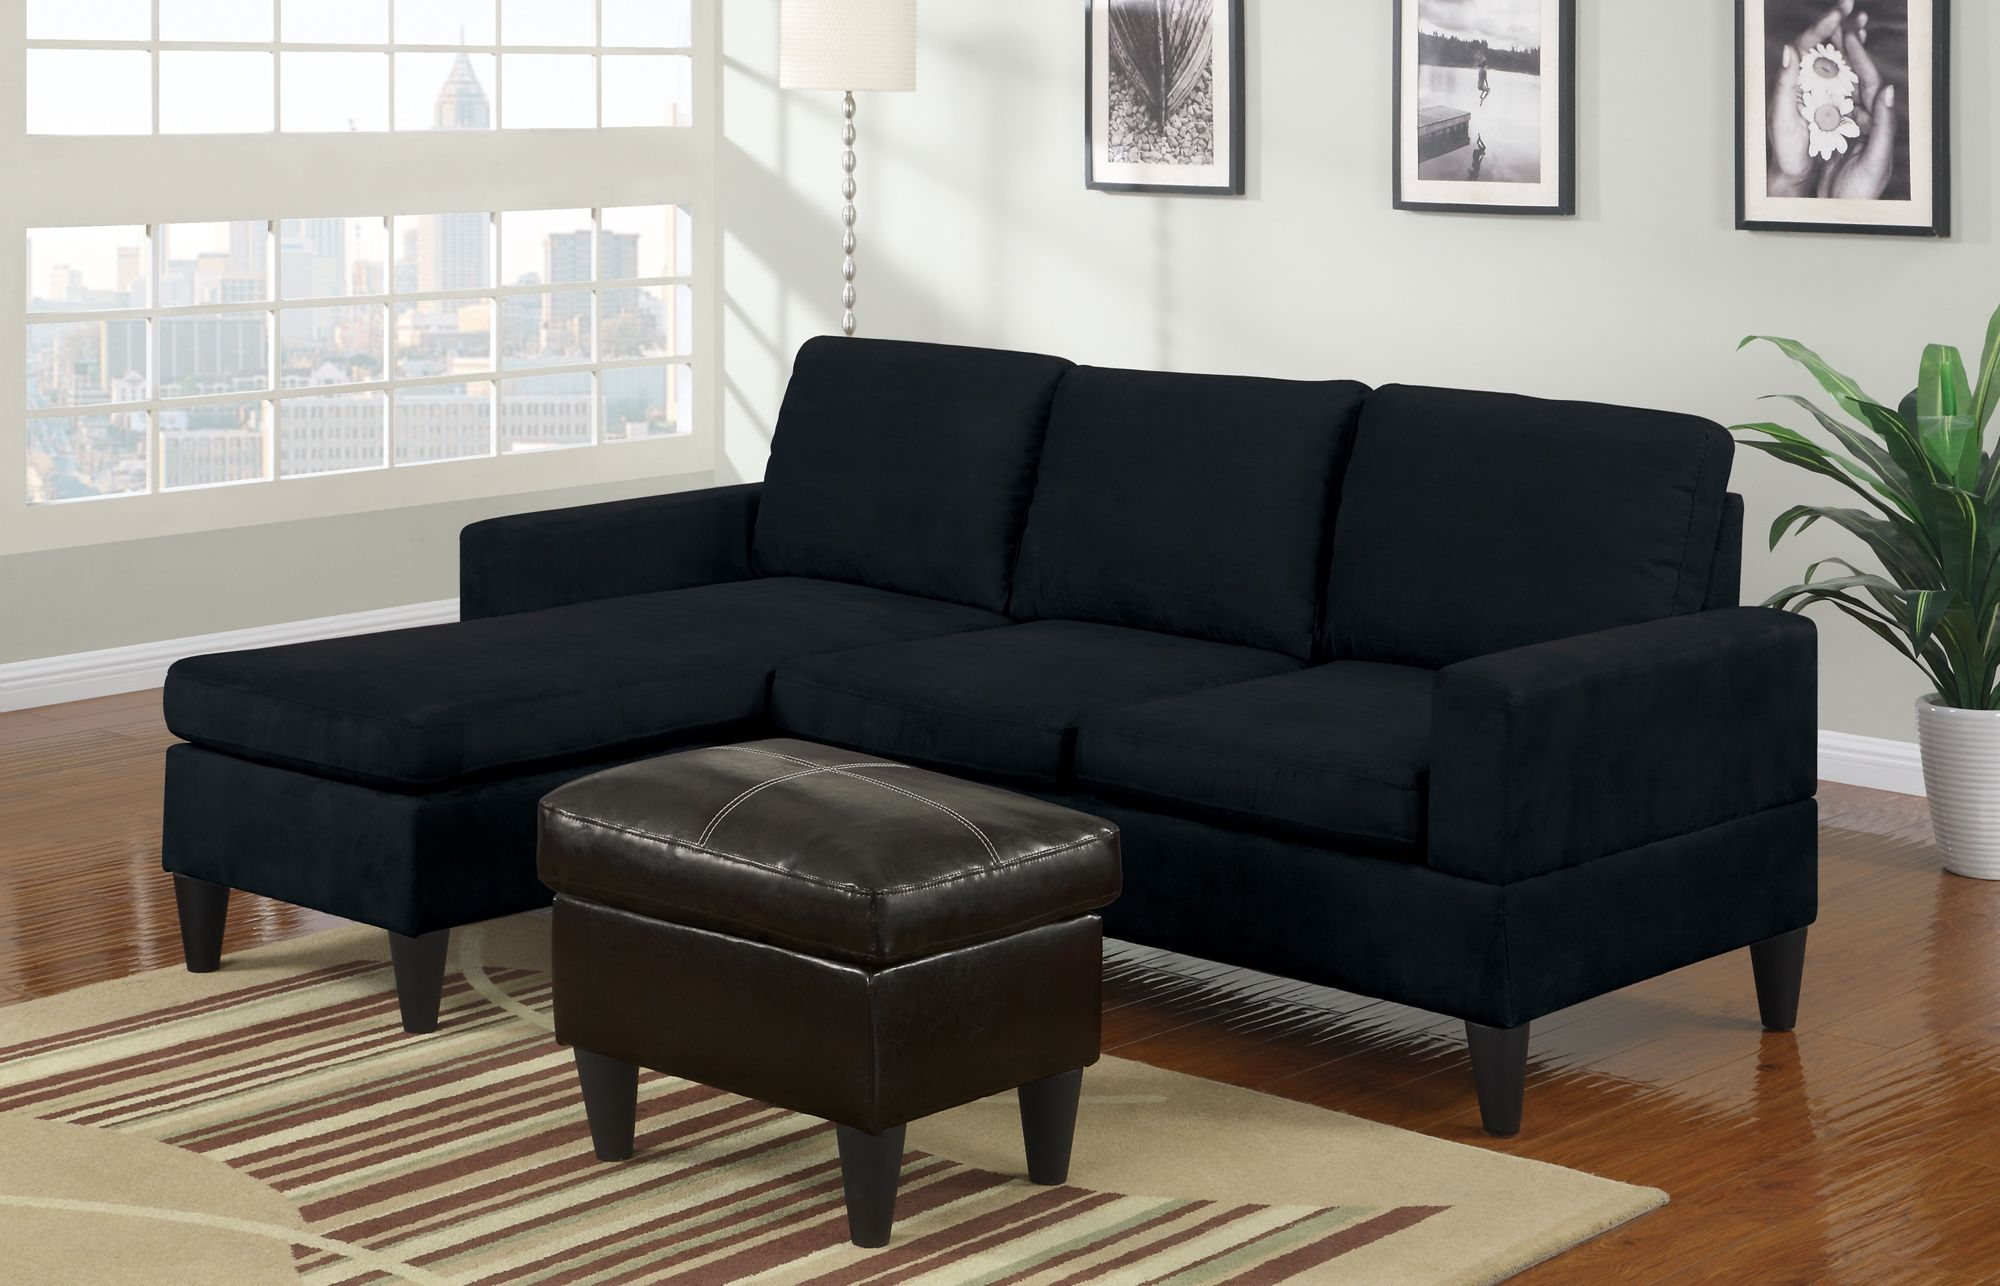 Small Black Microfiber Sectional Sofa